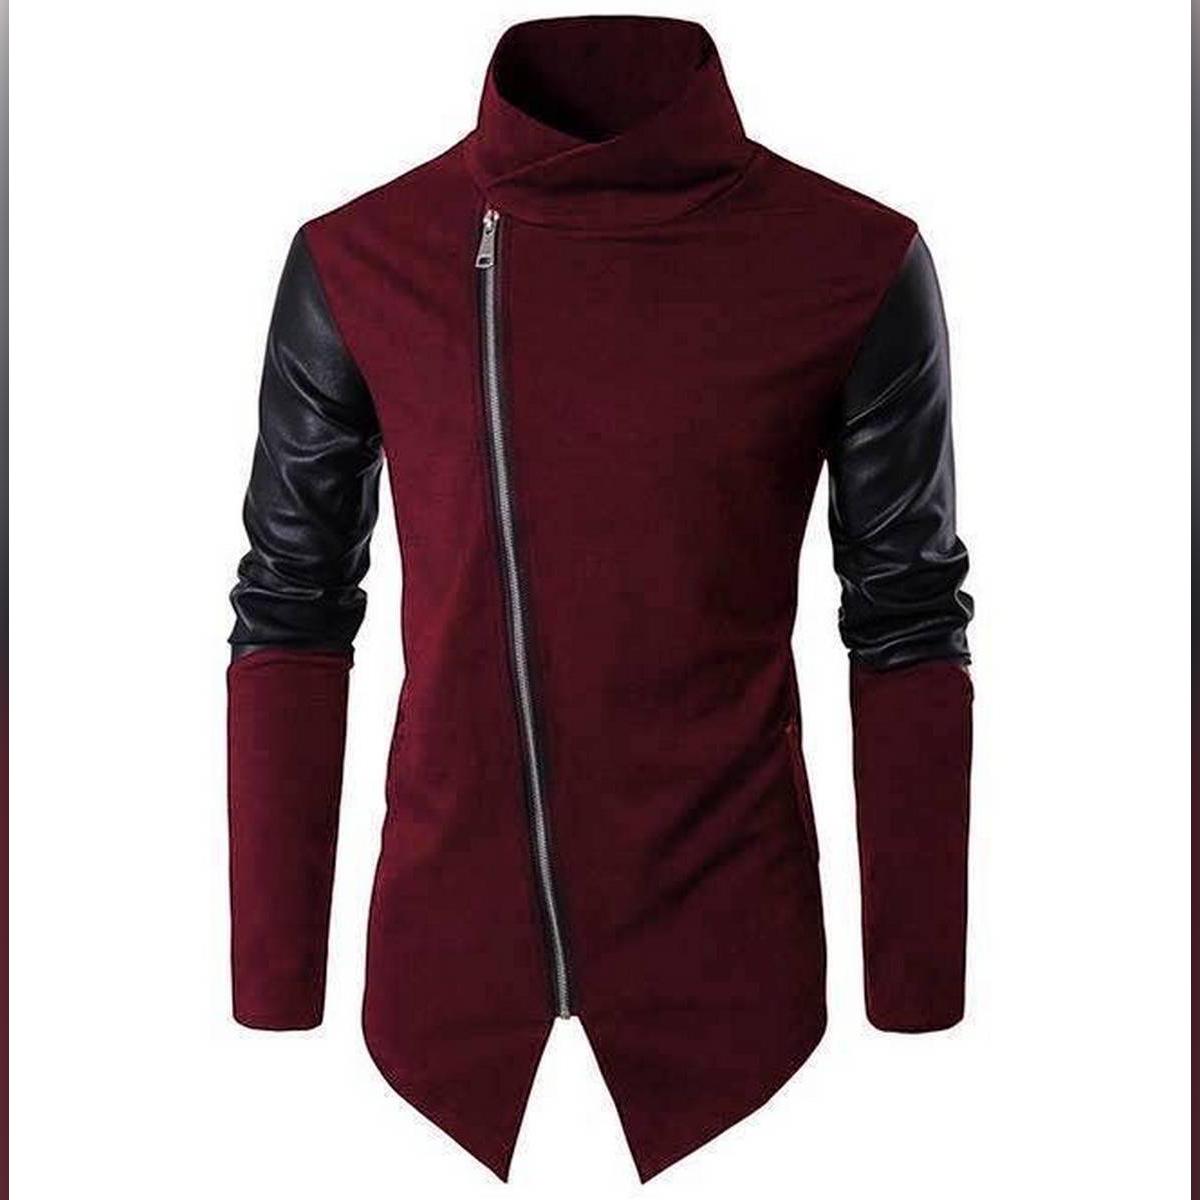 Oxygen Clothing Maroon Zipper Cardigan for Men